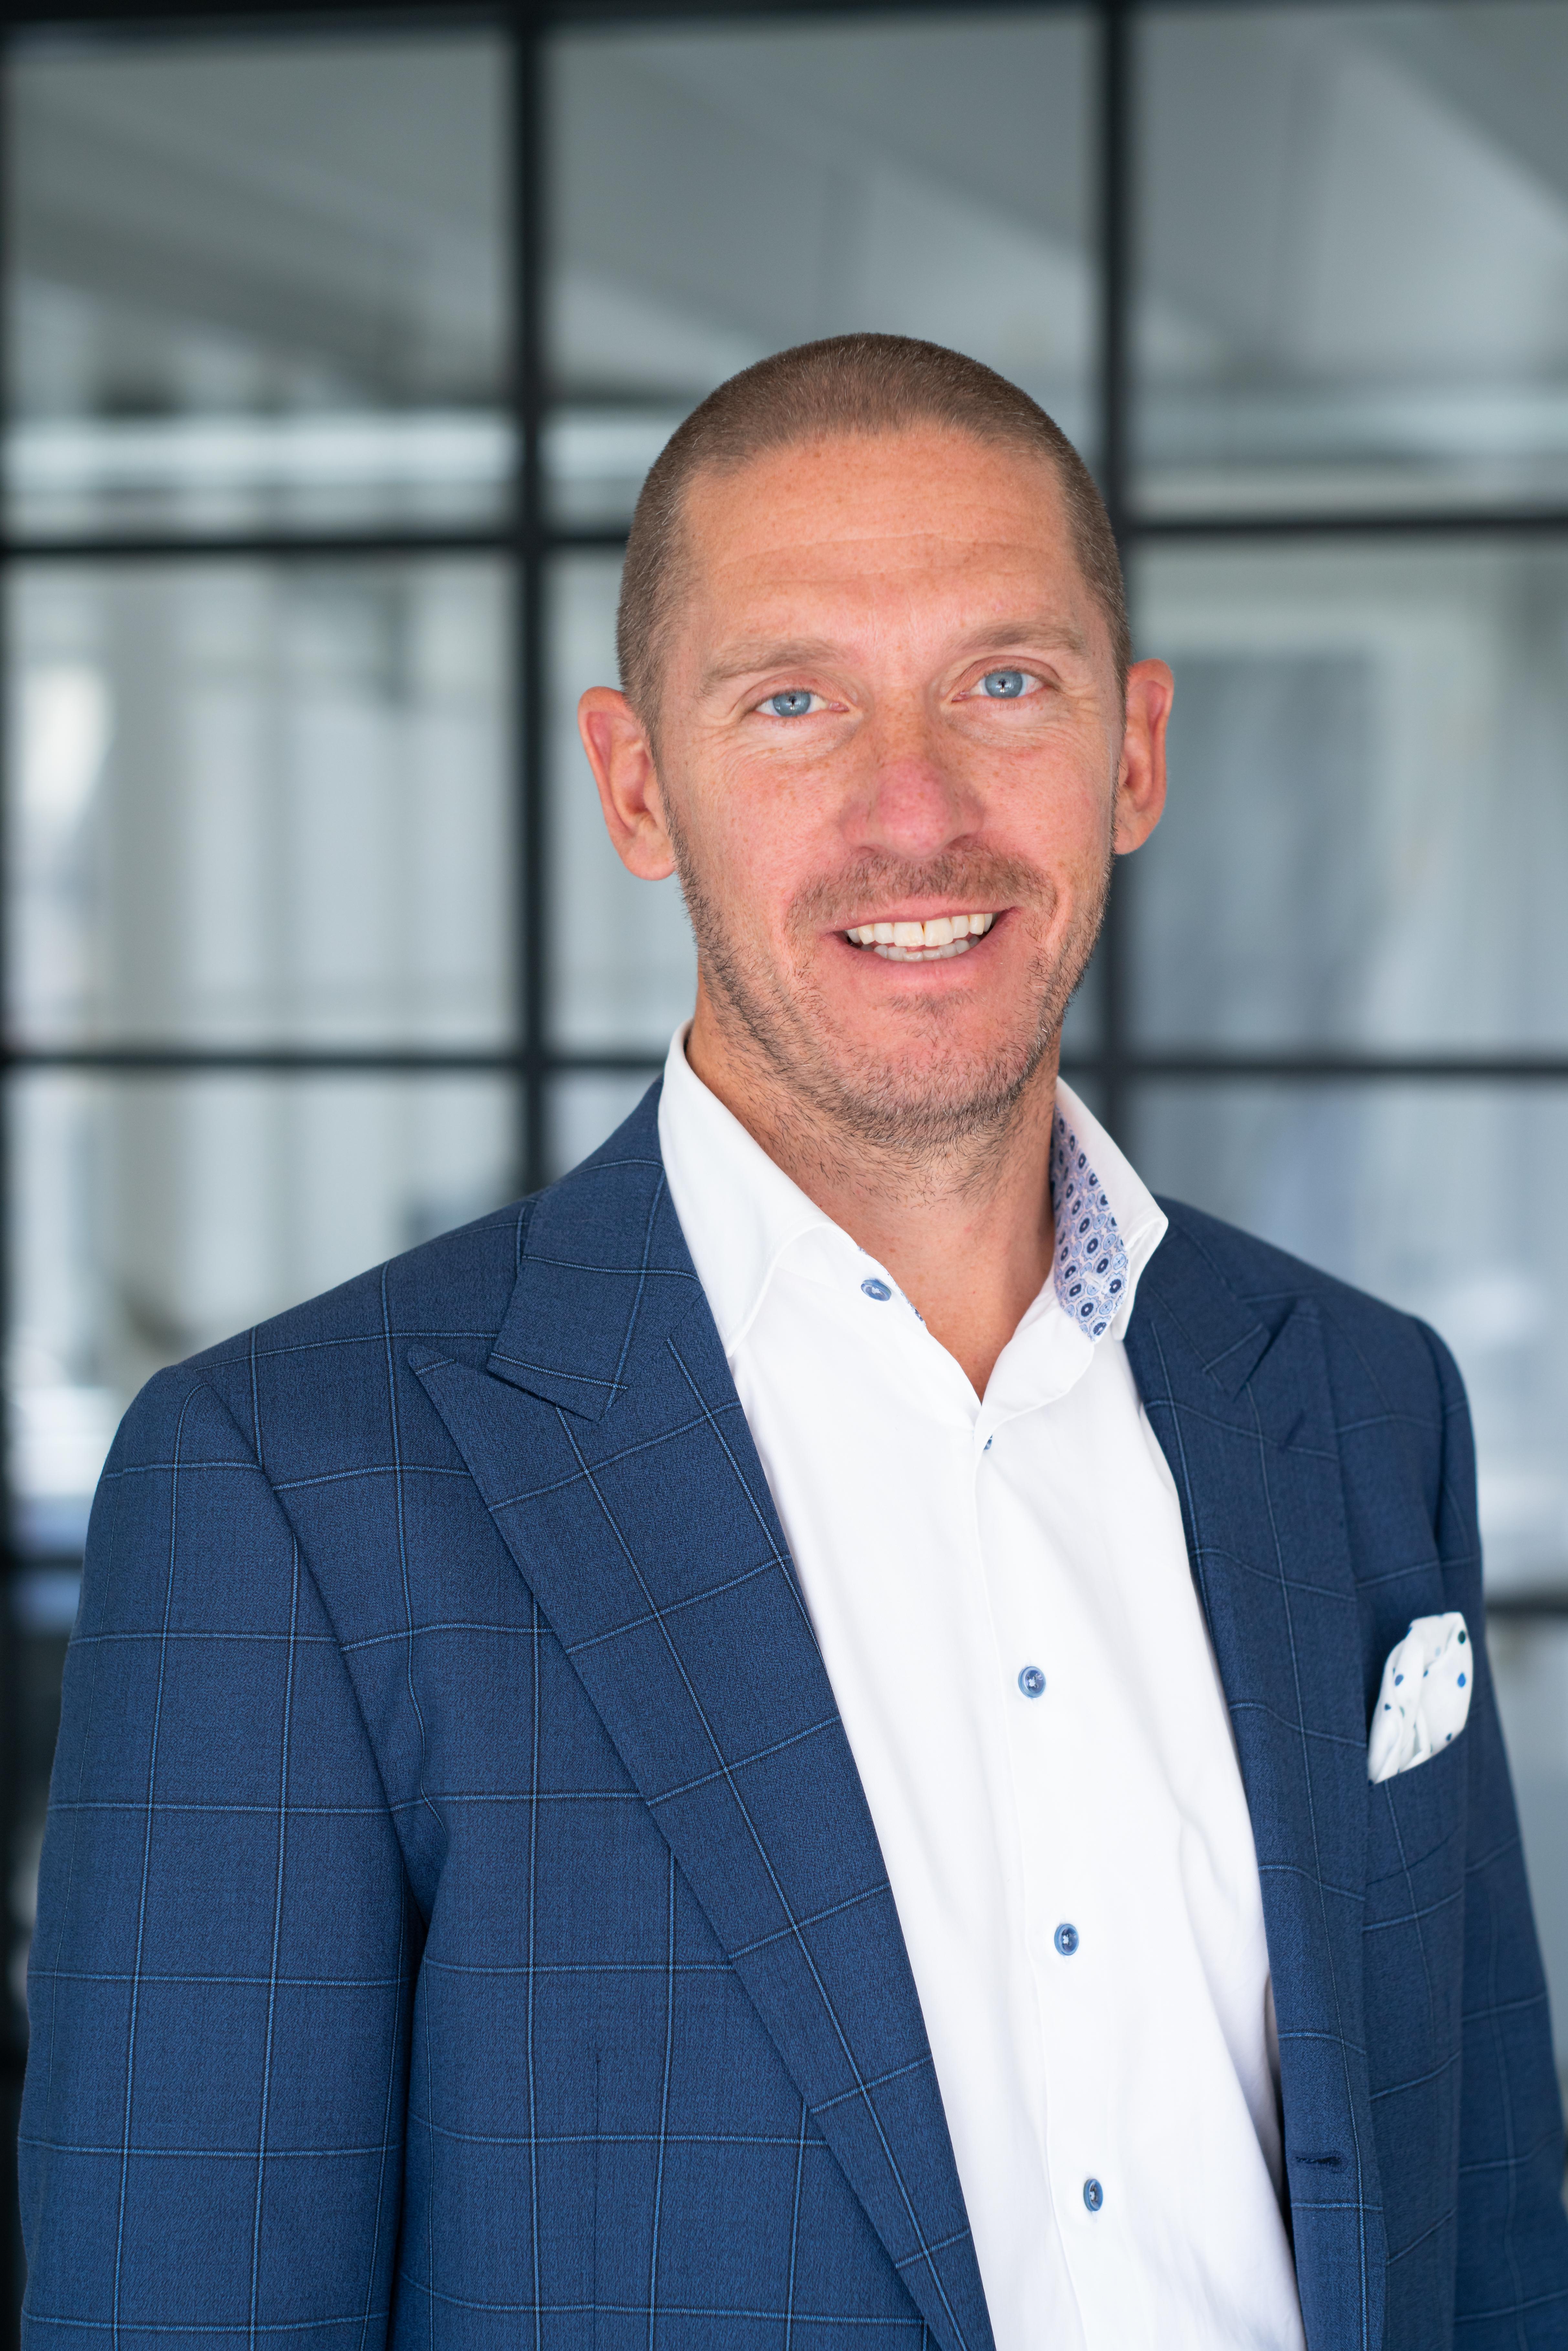 Ulrik Monberg, CEO & Founder